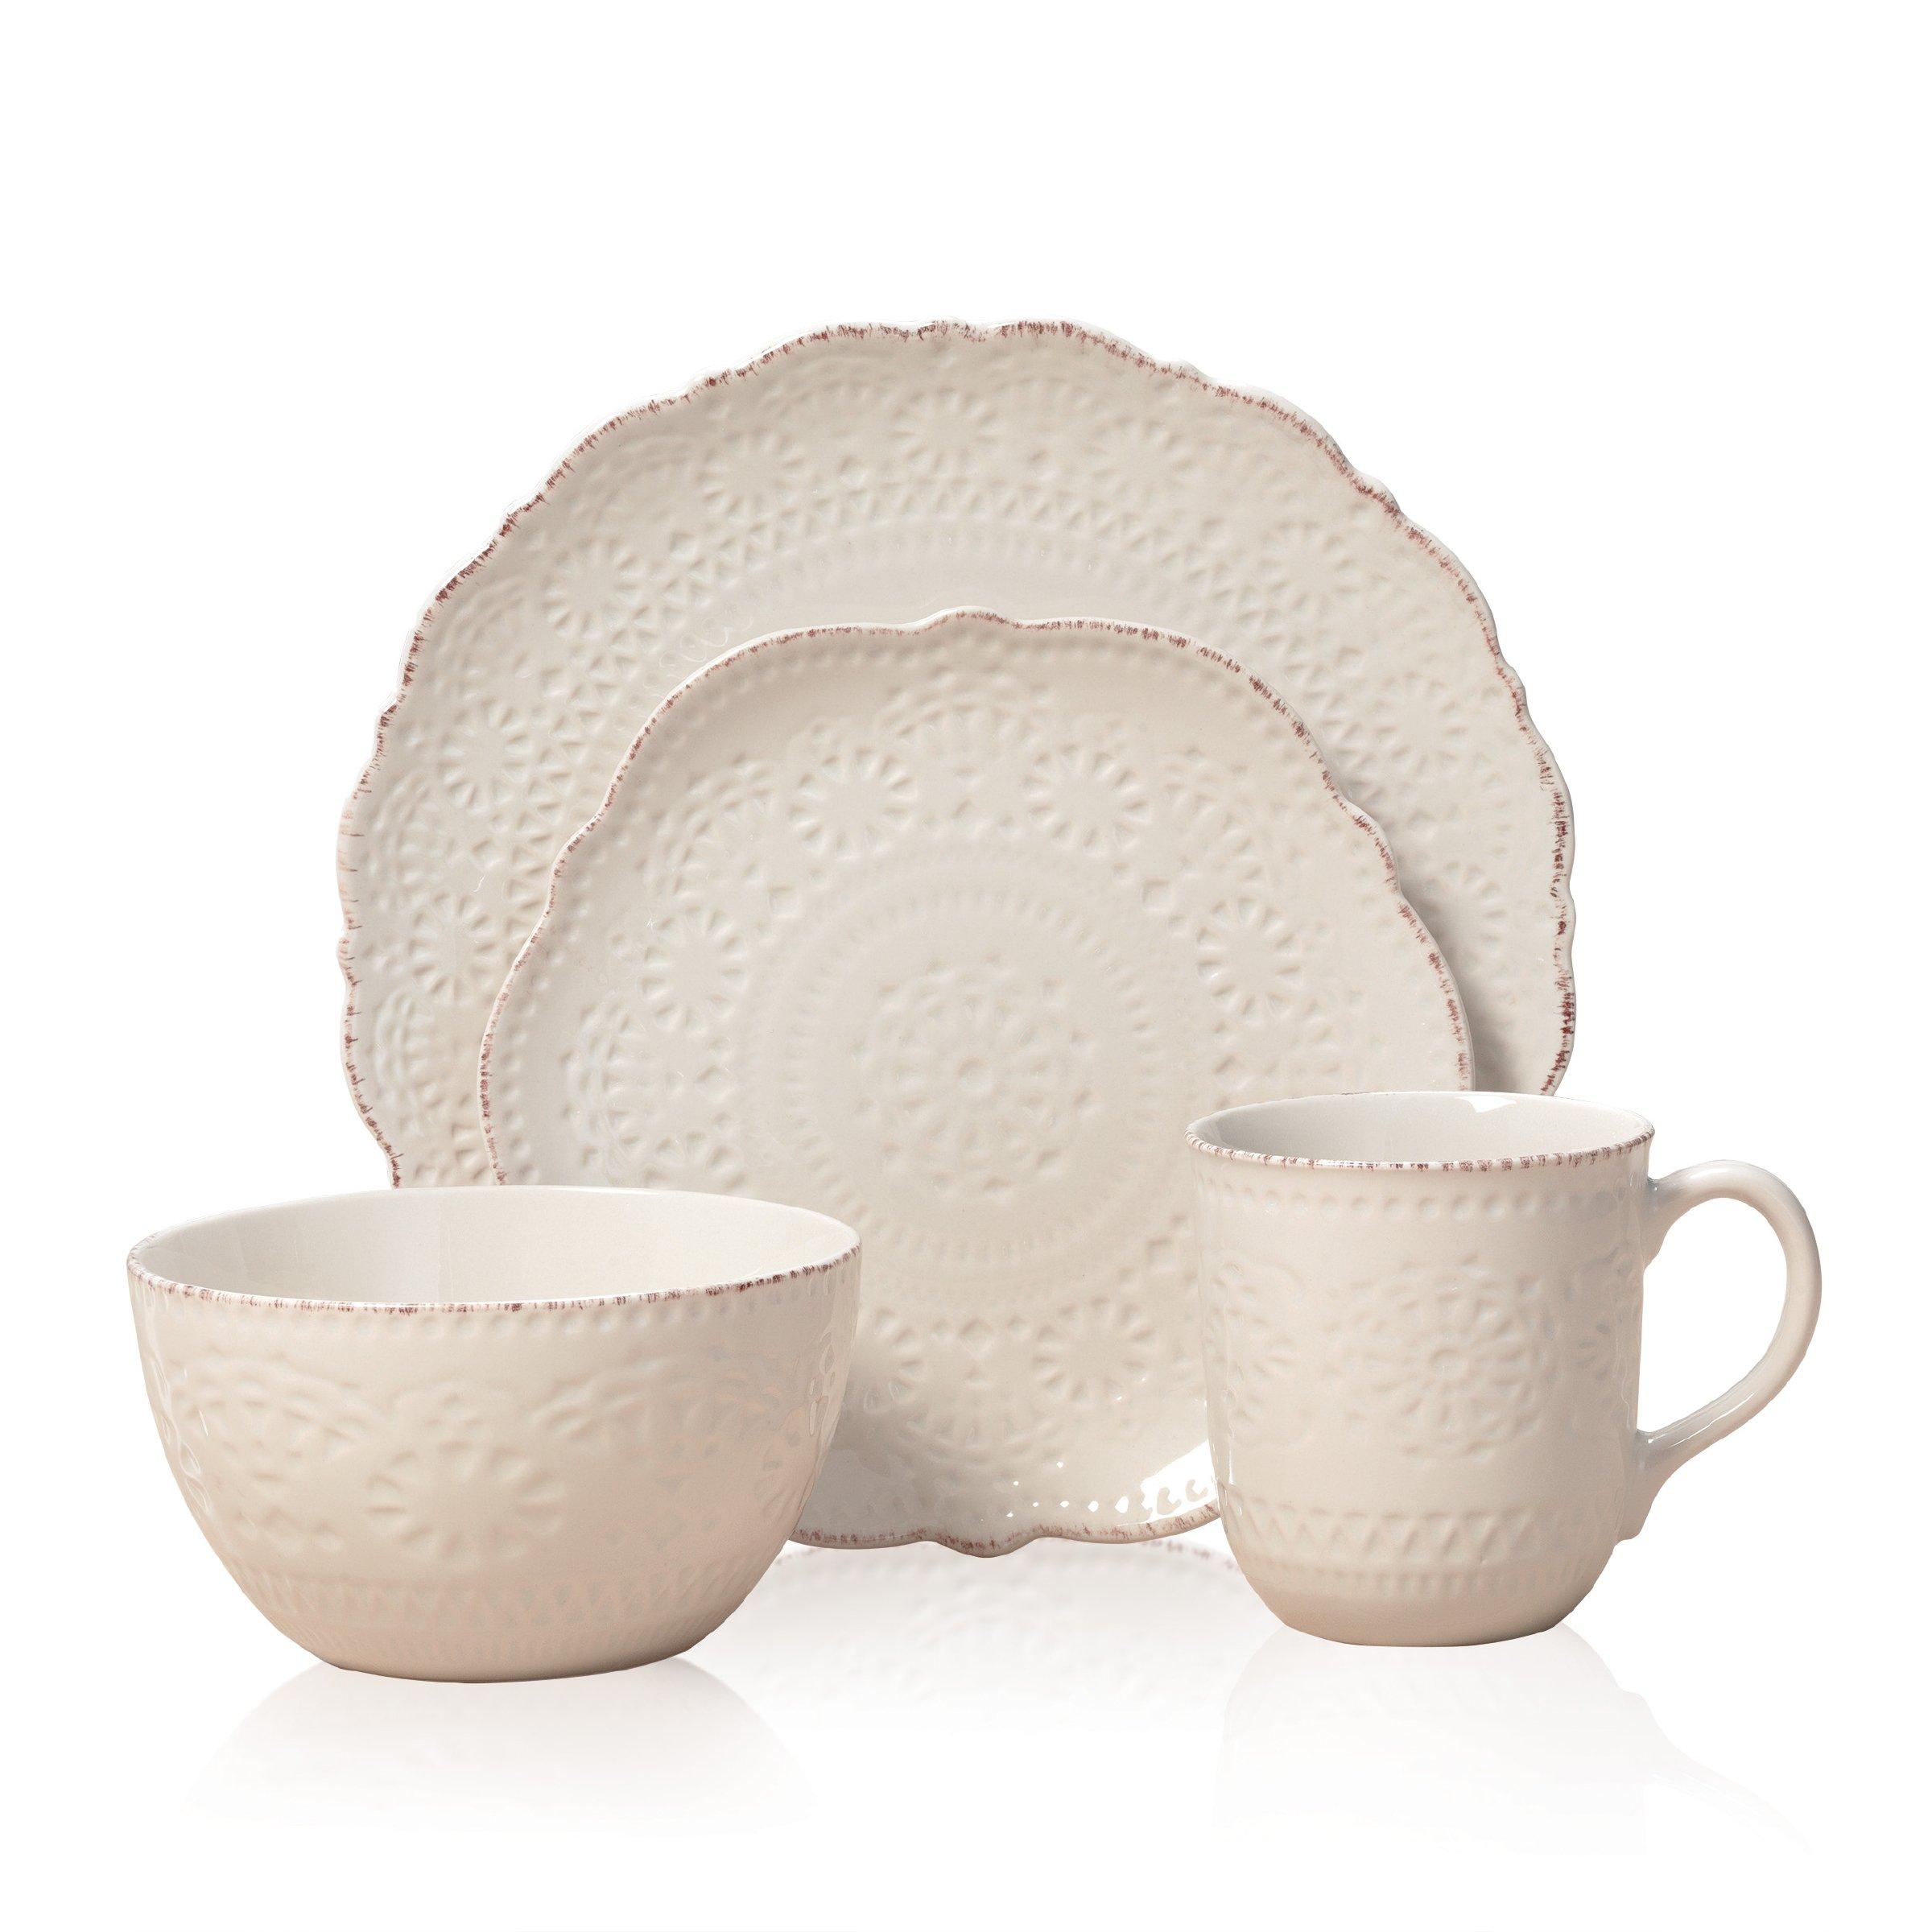 Pfaltzgraff Chateau Cream 16-Piece Stoneware Dinnerware Set, Service For 4